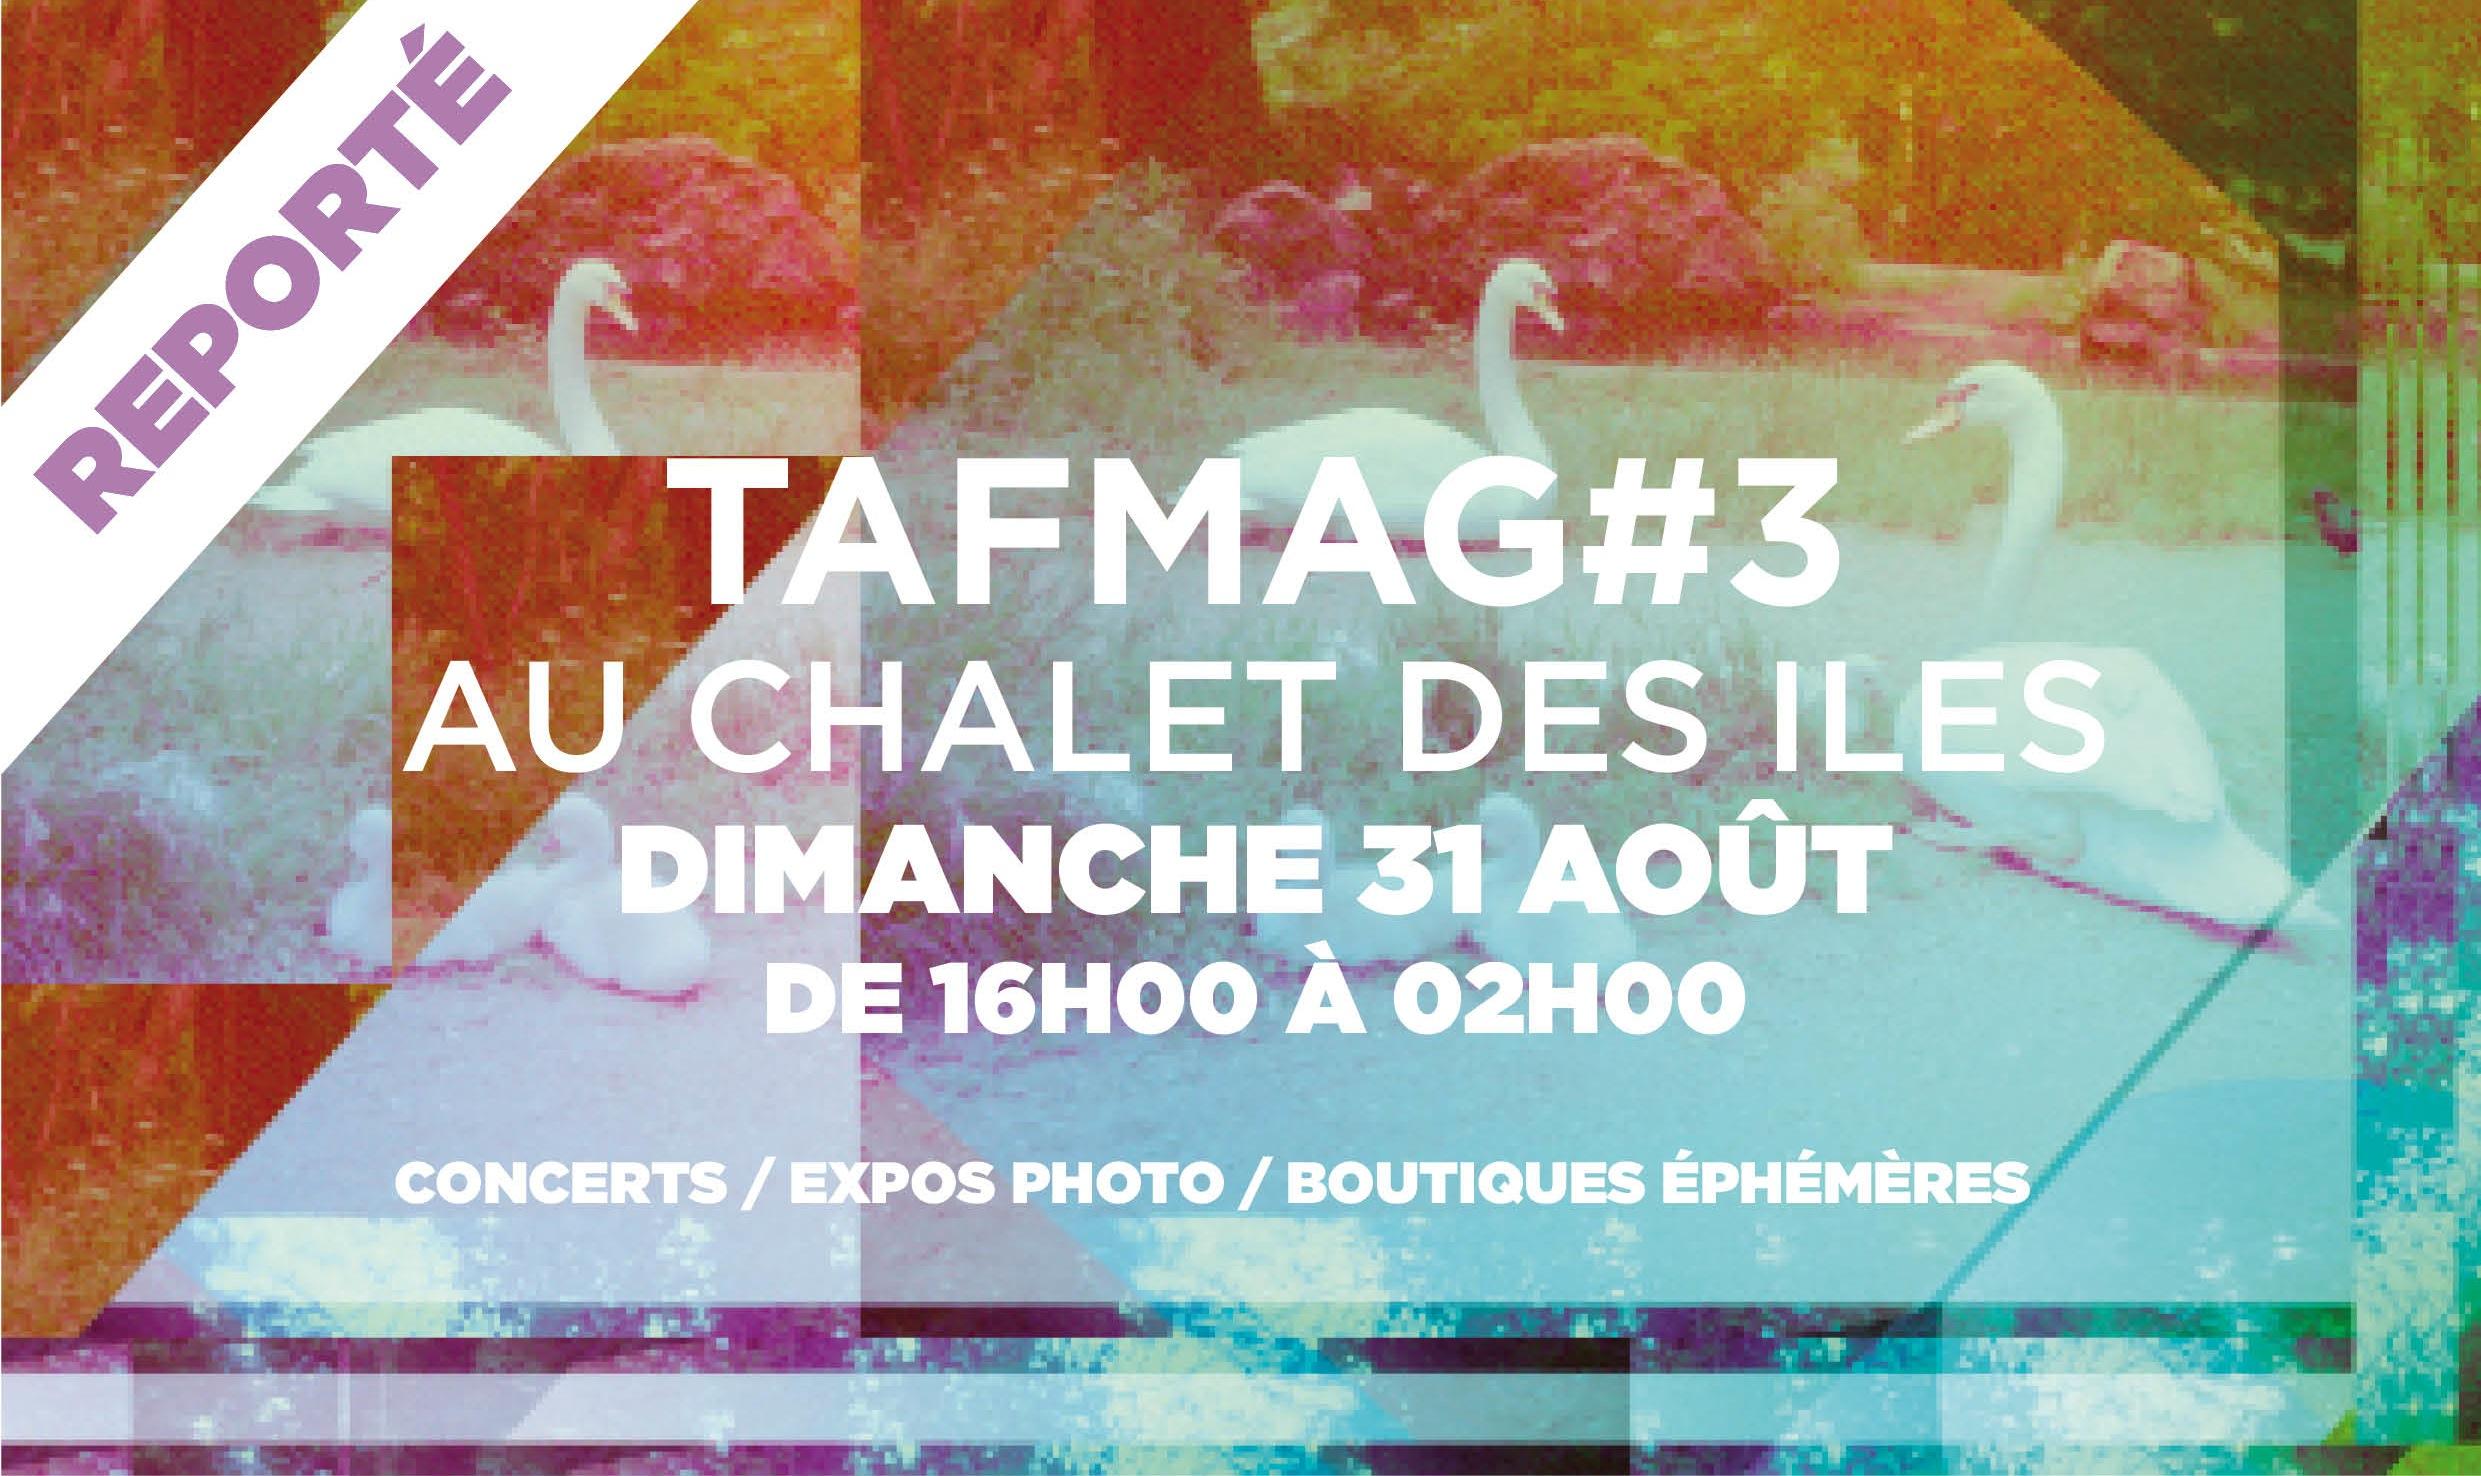 newletter tafmag#3 reporté copy